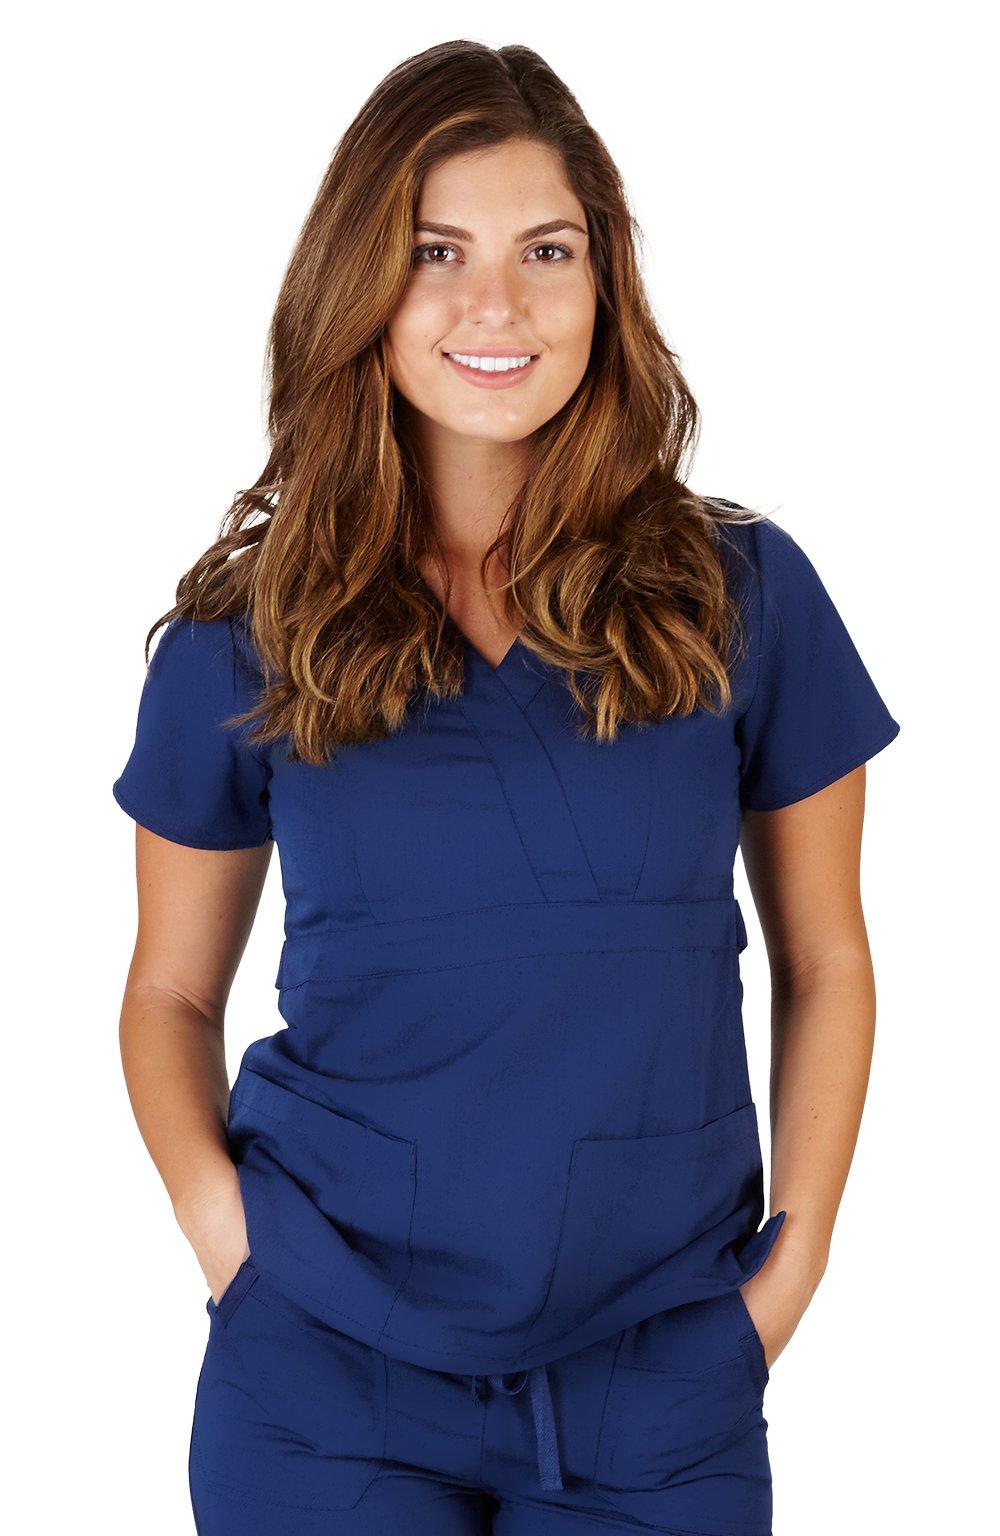 Ultra Soft Brand Scrubs - Premium Womens Junior Fit 3 Pocket Mock Wrap Scrub Top, Navy 36150-X-Small by ULTRASOFT SCRUBS (Image #1)